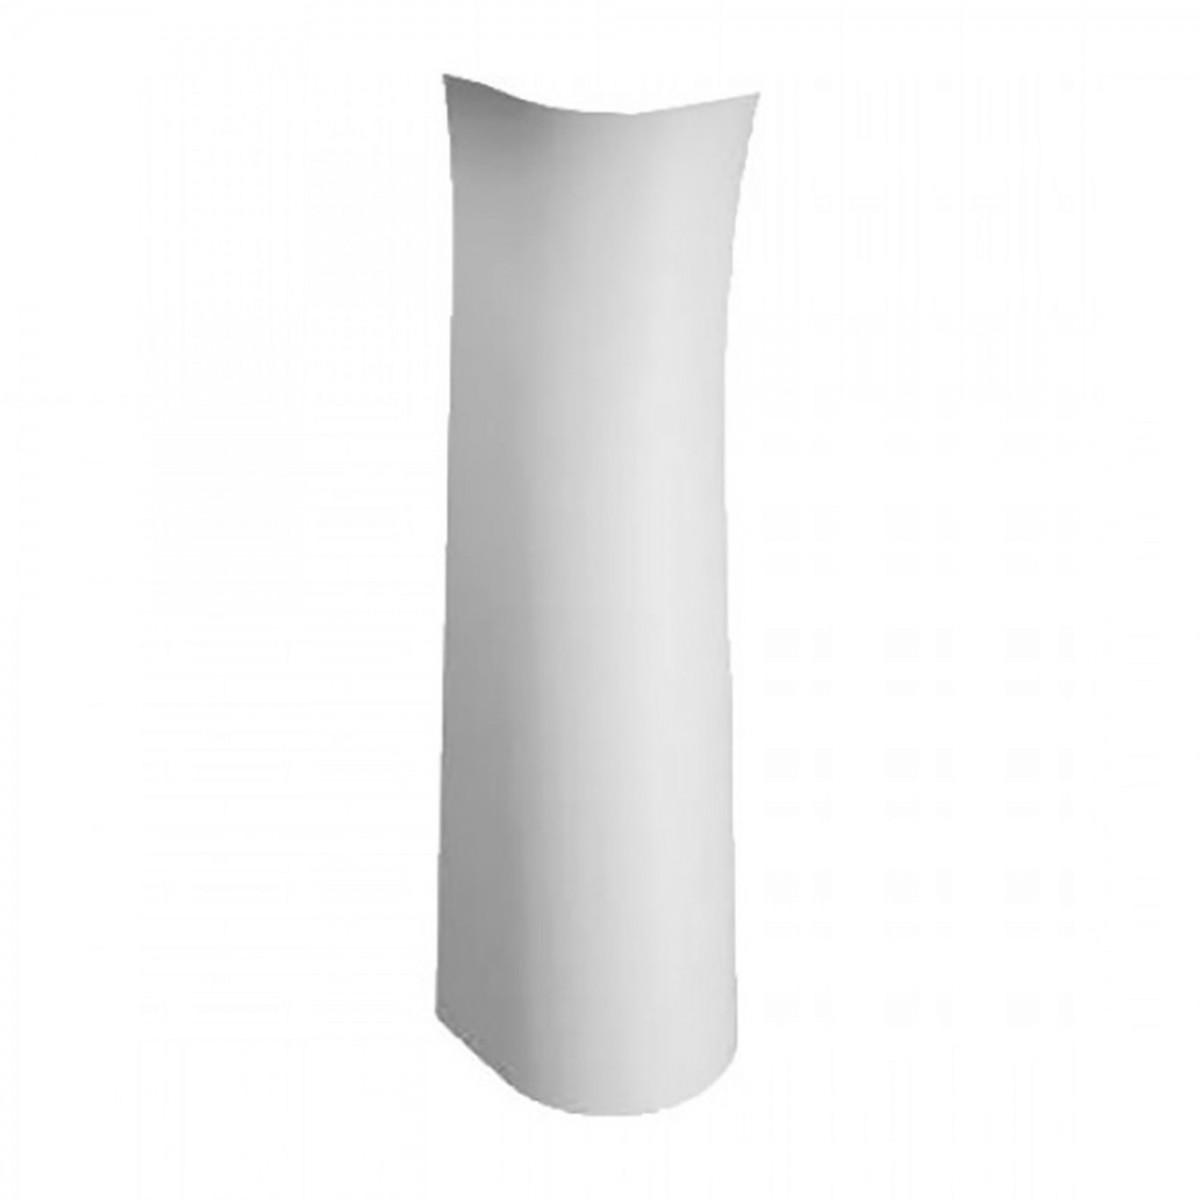 Coluna Convencional Ravena Deca Branco Ref. C.9.17